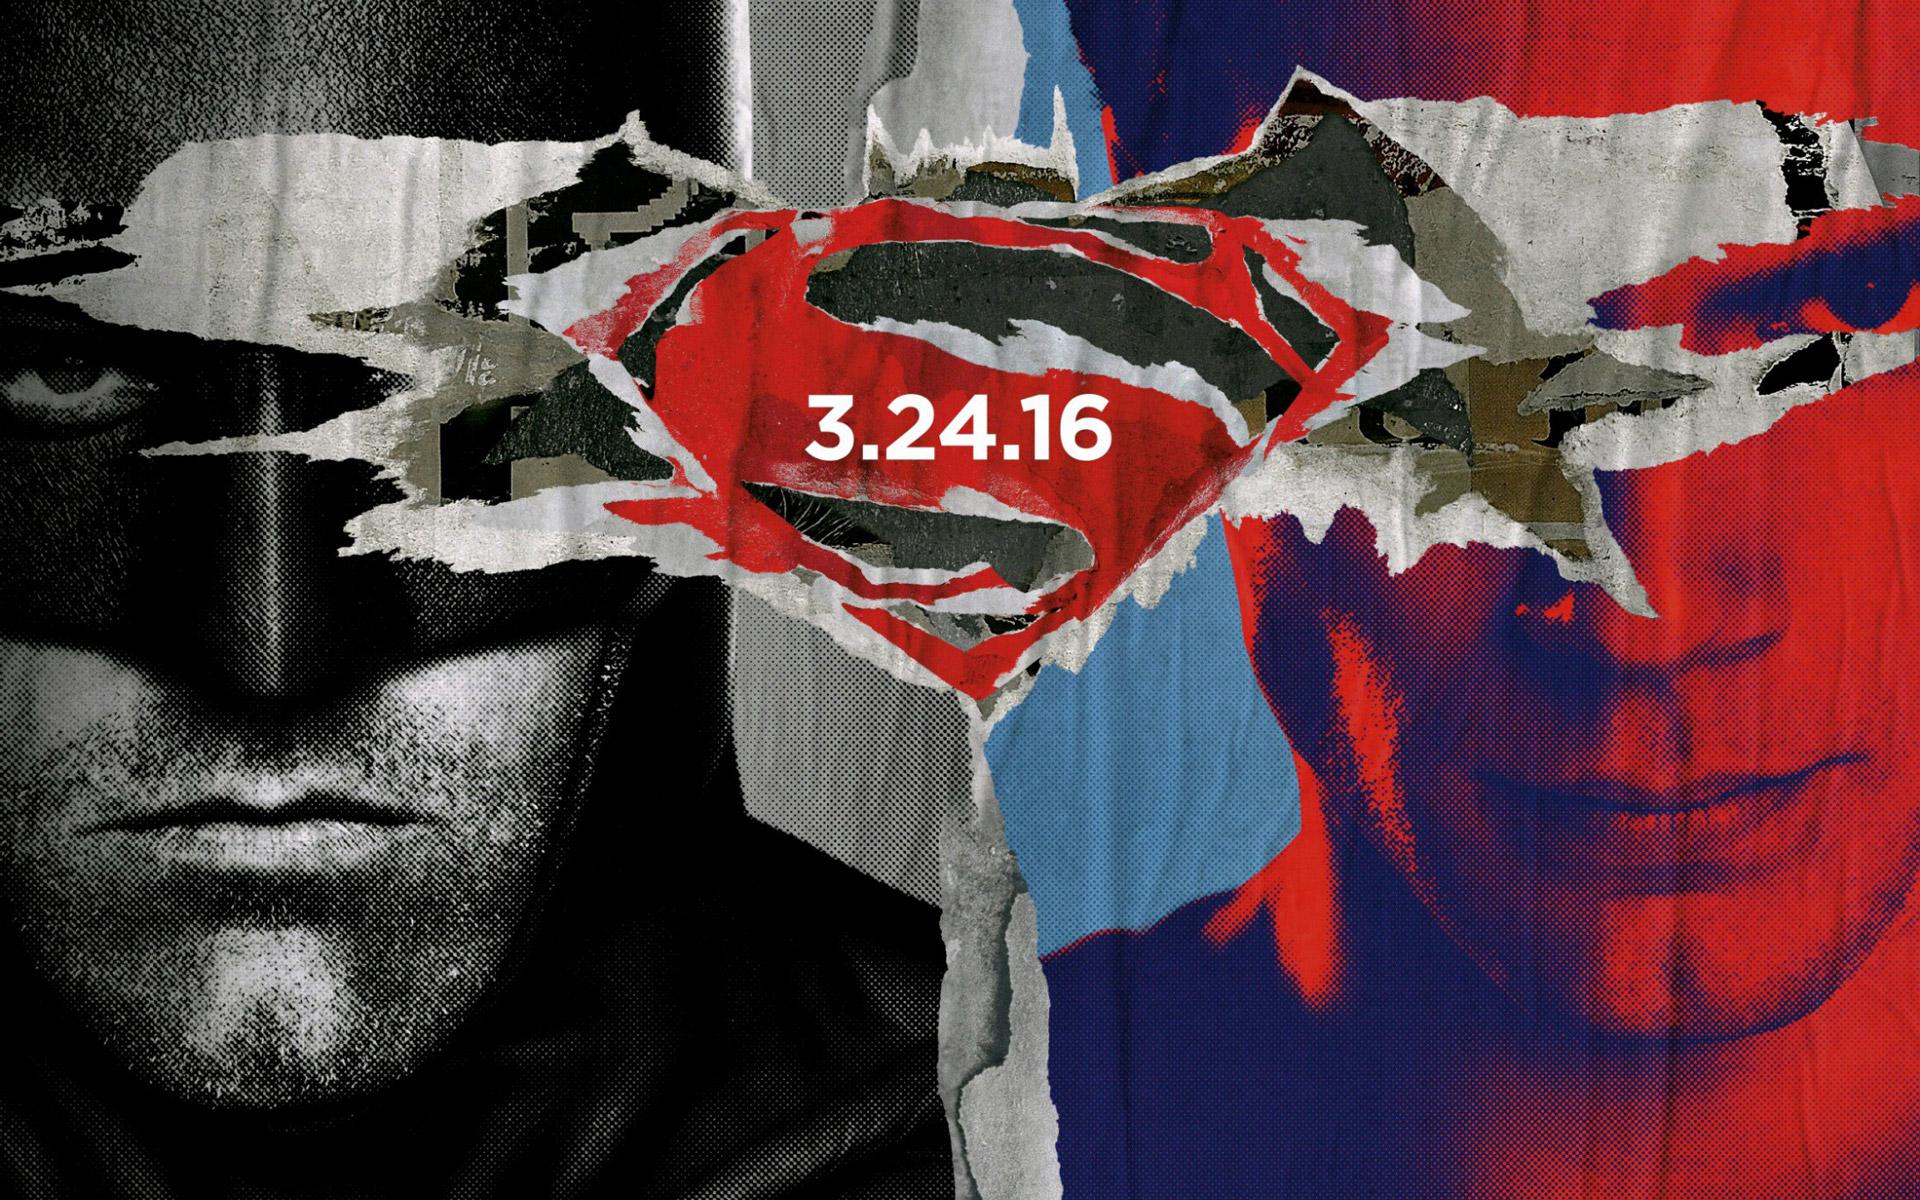 Batman V Superman Poster, HD Movies, 4k Wallpapers, Images